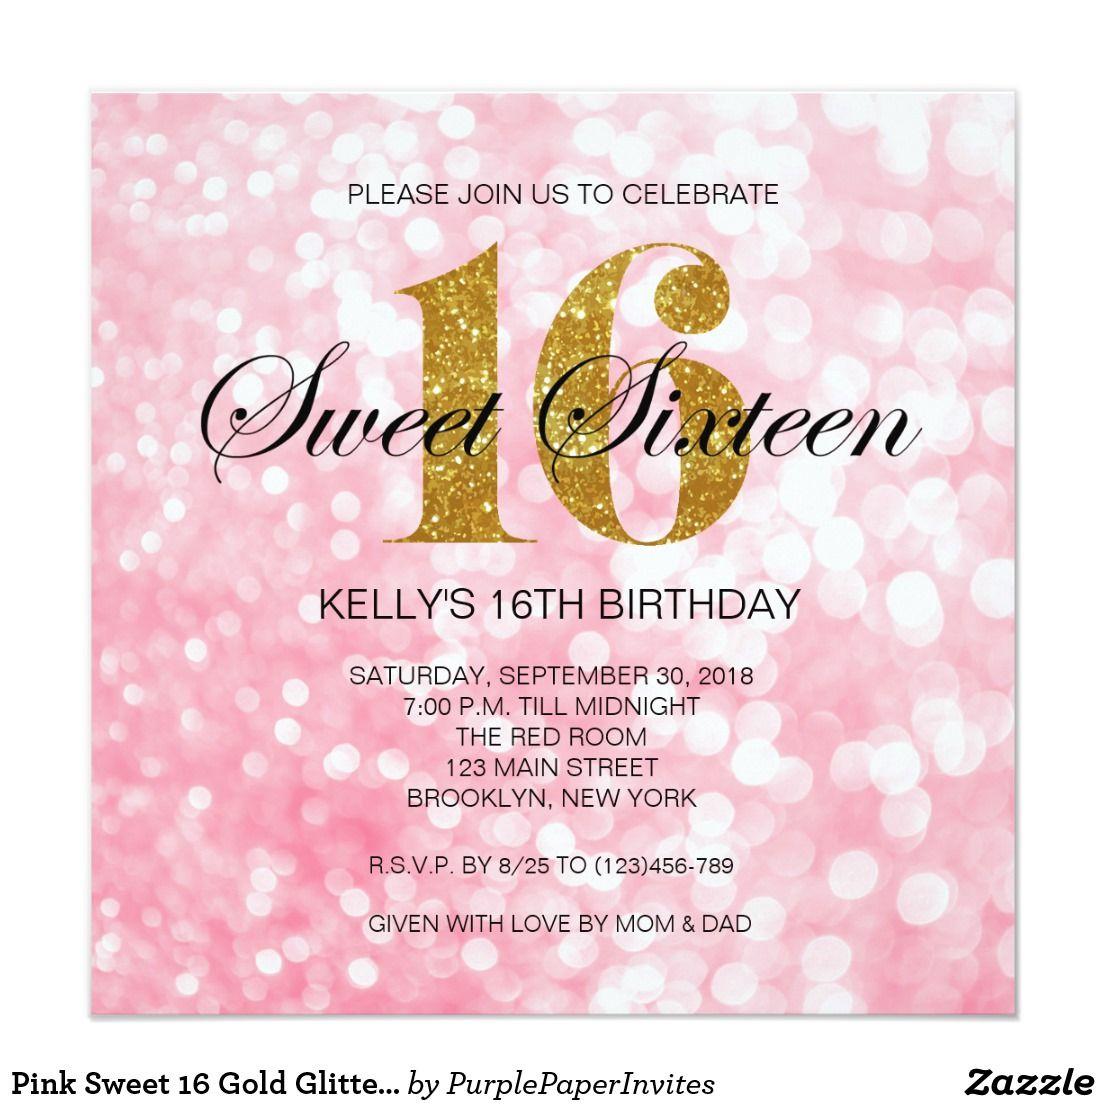 Pink Sweet 16 Gold Glitter Lights Invitation   Pink sweet 16, Sweet ...